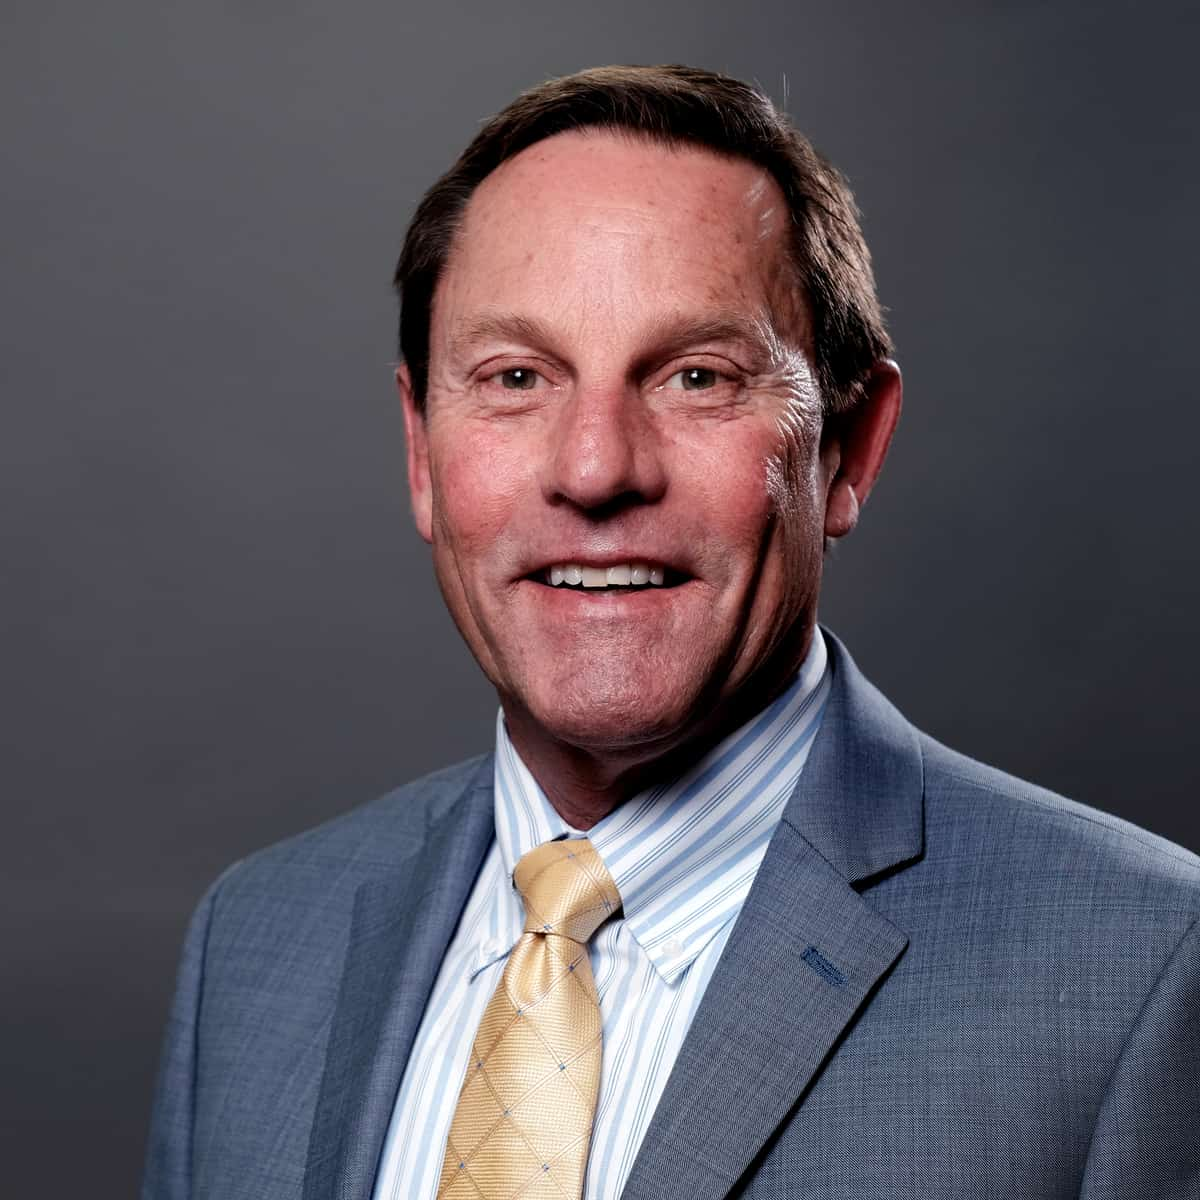 Steve-Weston-Kalamazoo-Personal-Injury-Attorney